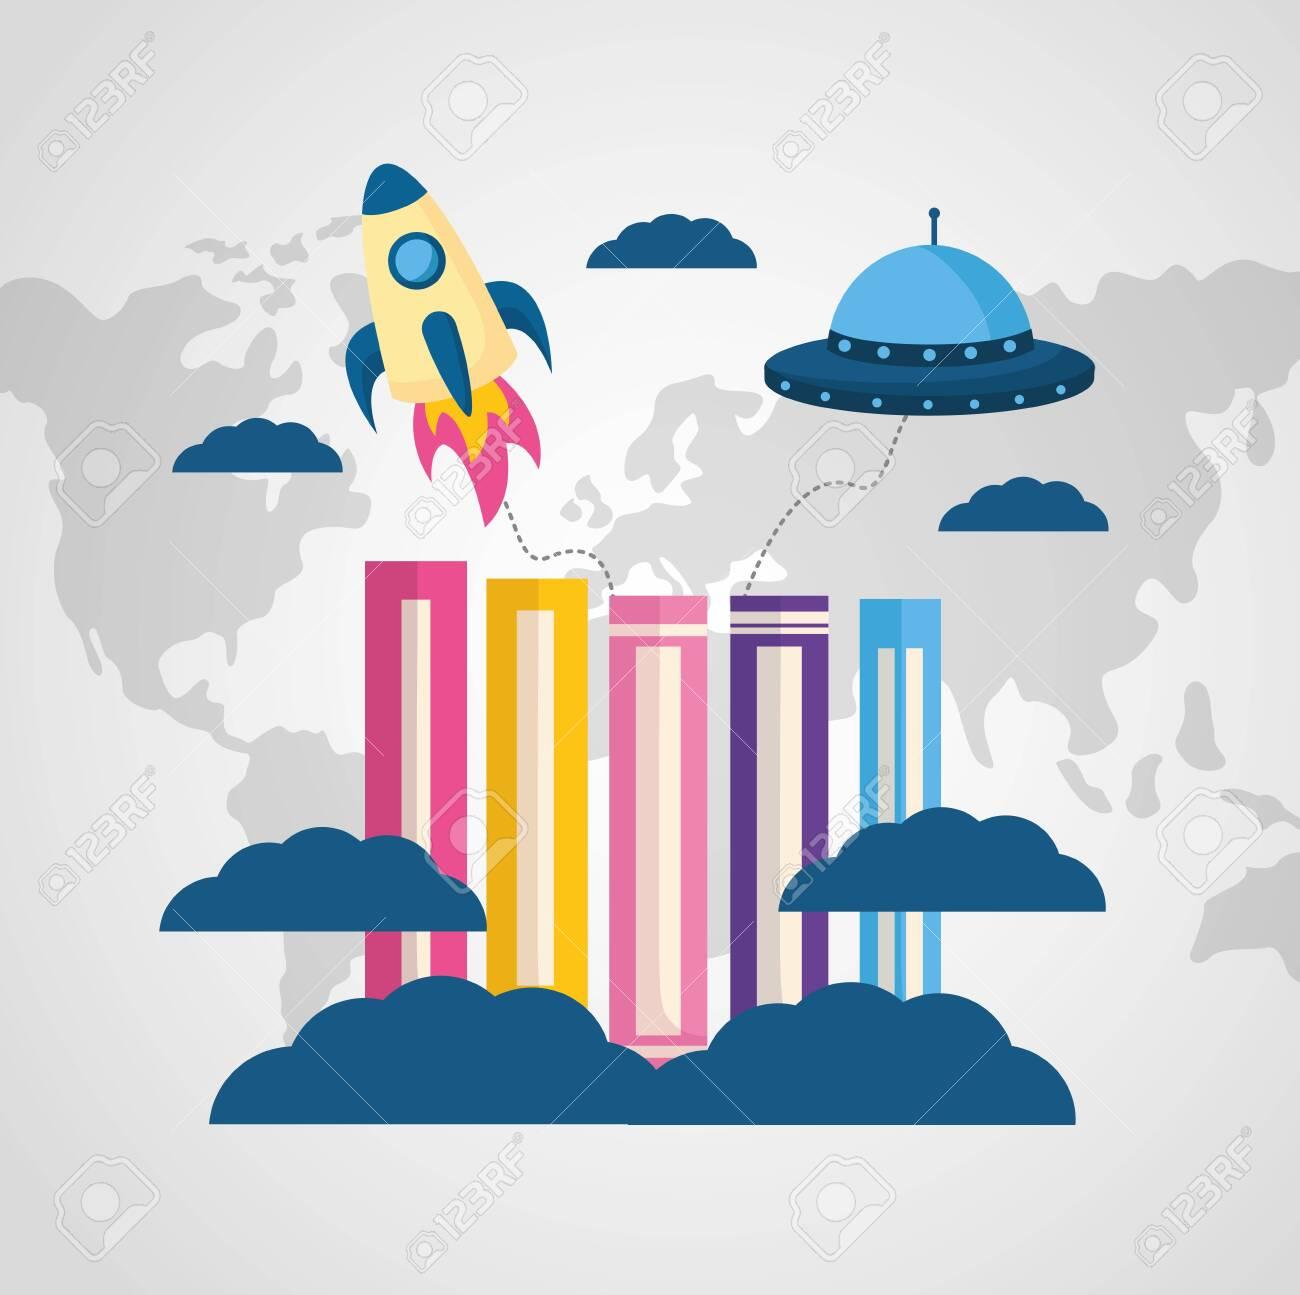 world book day travle rocket ufo imagination vector illustration - 124576802